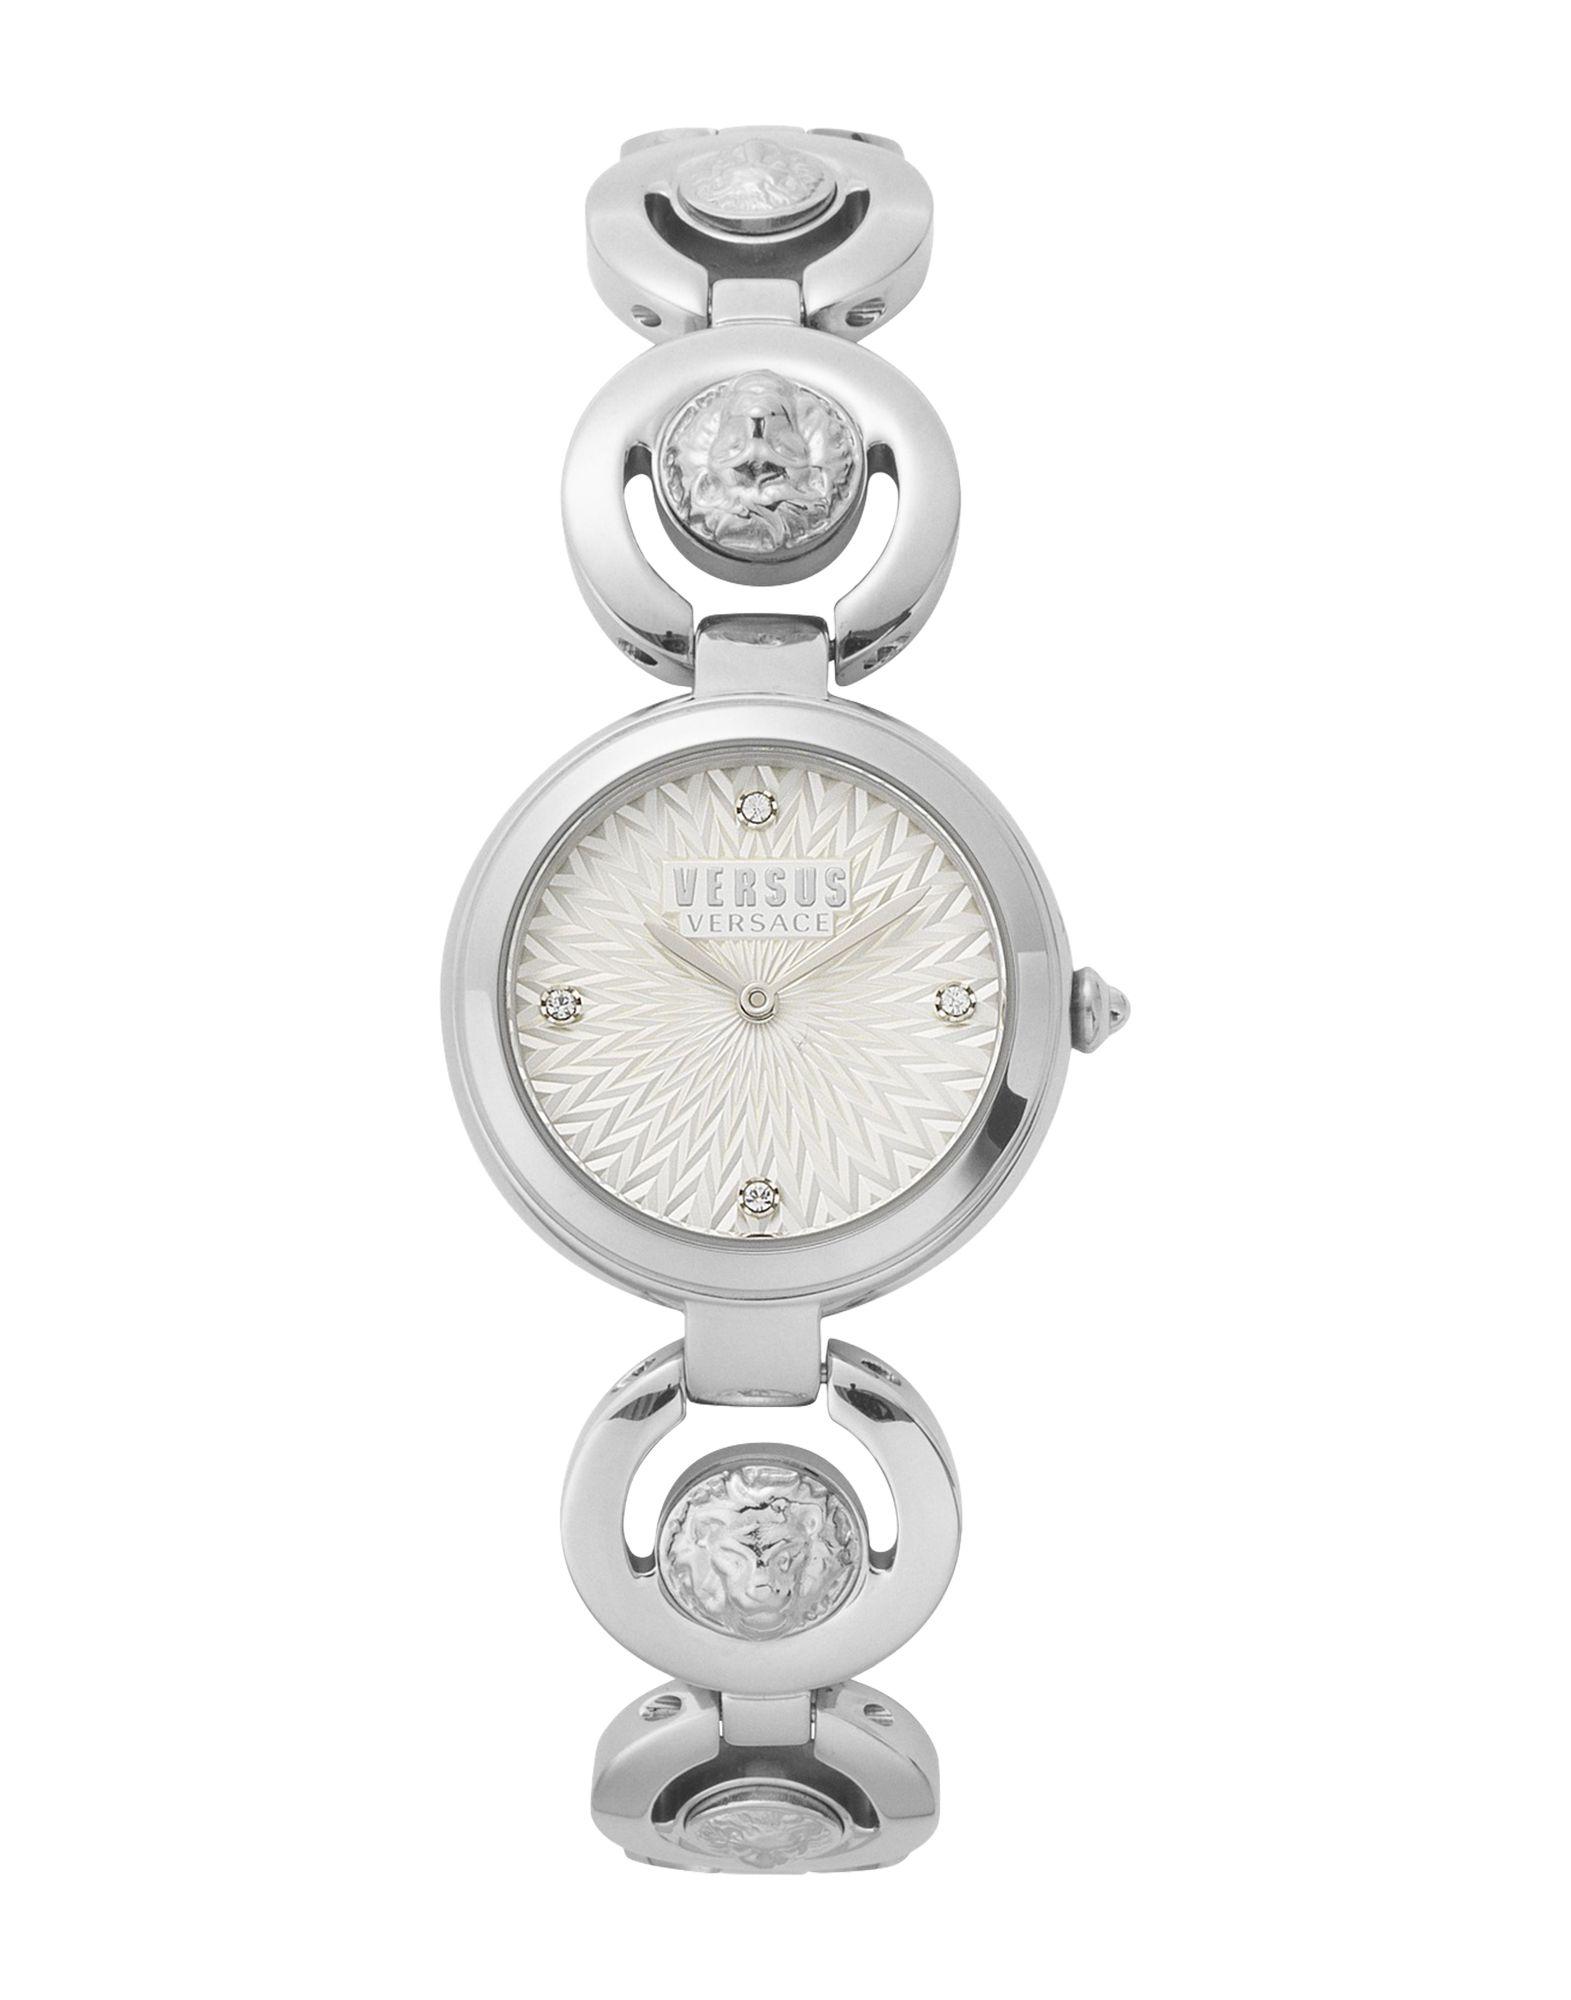 VERSUS VERSACE Wrist watches - Item 58050855